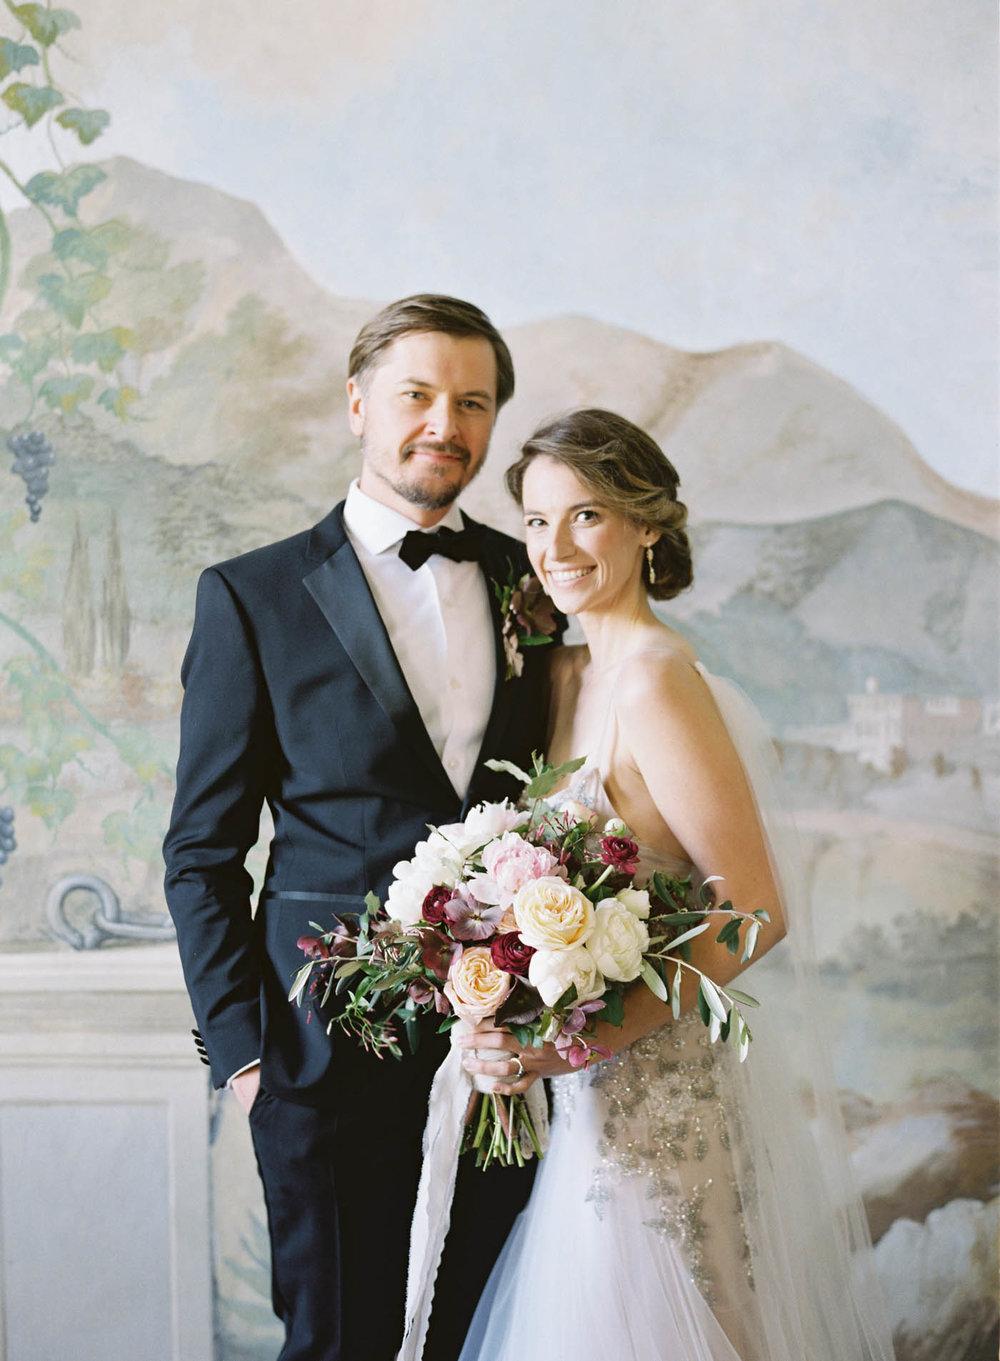 Villa_Cetinale_Wedding-25-Jen_Huang-ElanJacob-186-Jen_Huang-007300-R1-016.jpg